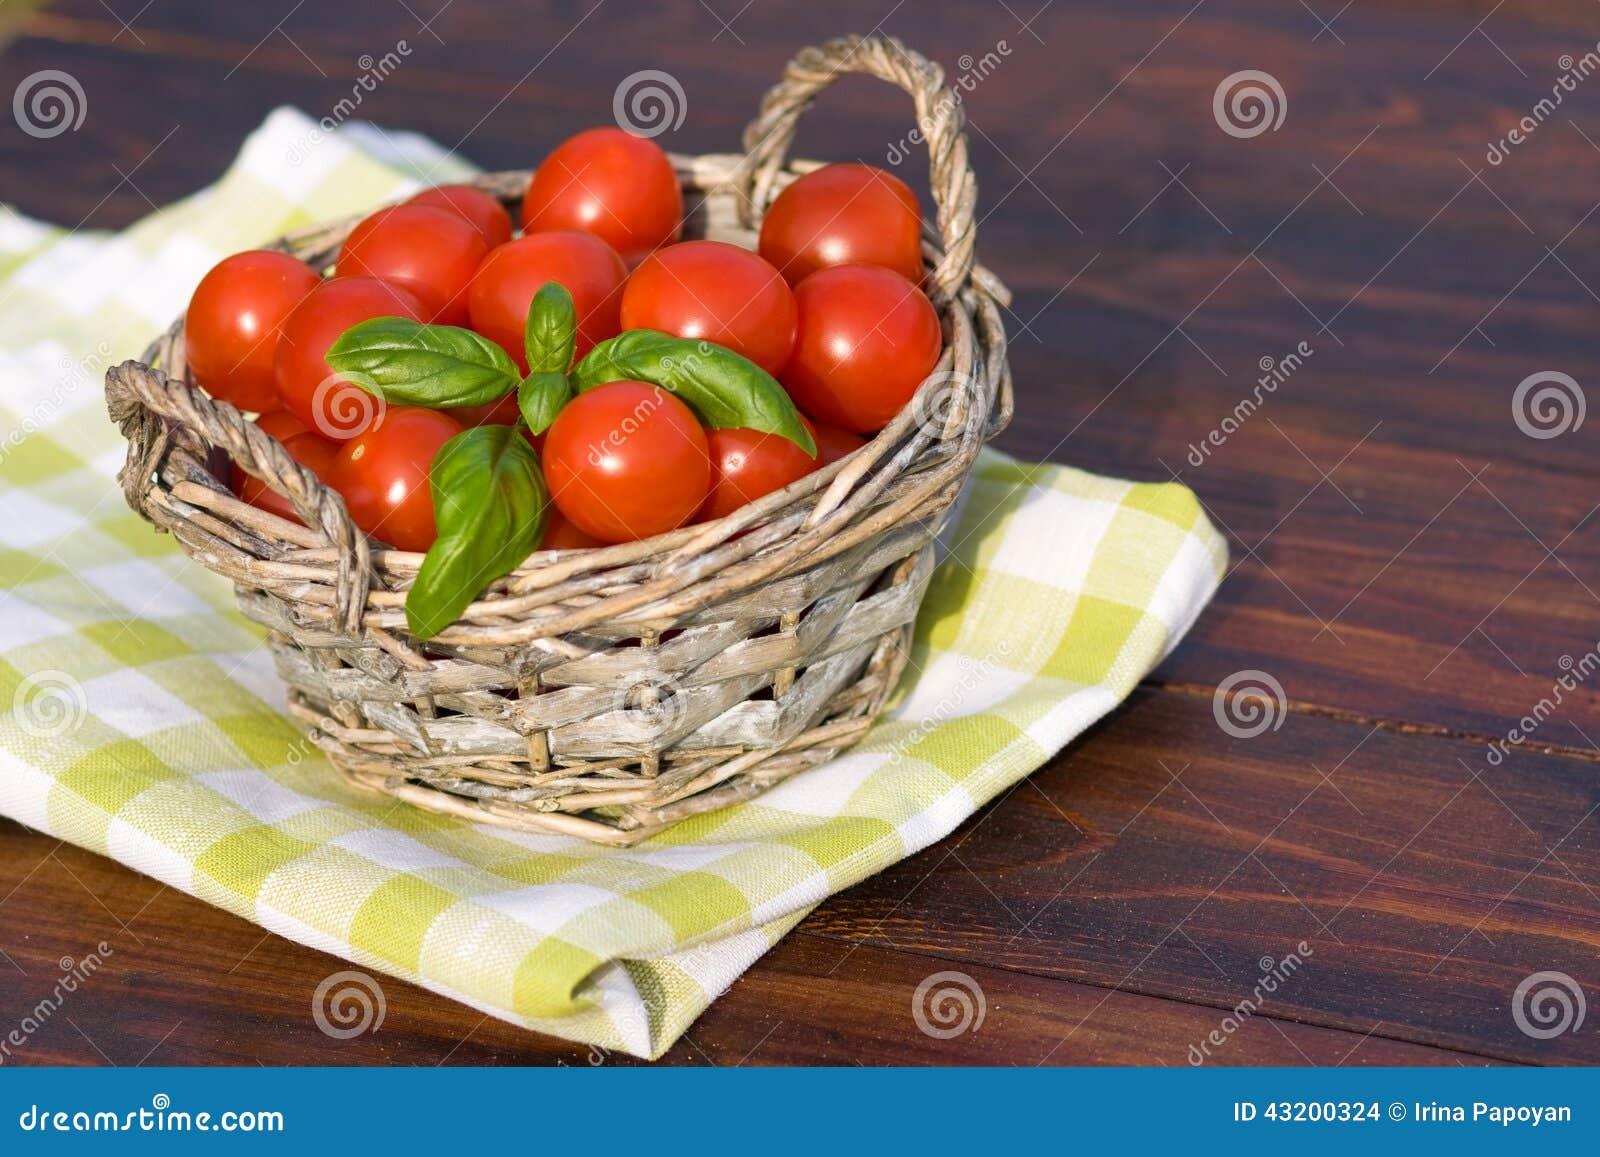 Download Tomater Med Basilika I Korg Utomhus Arkivfoto - Bild av lampa, banta: 43200324